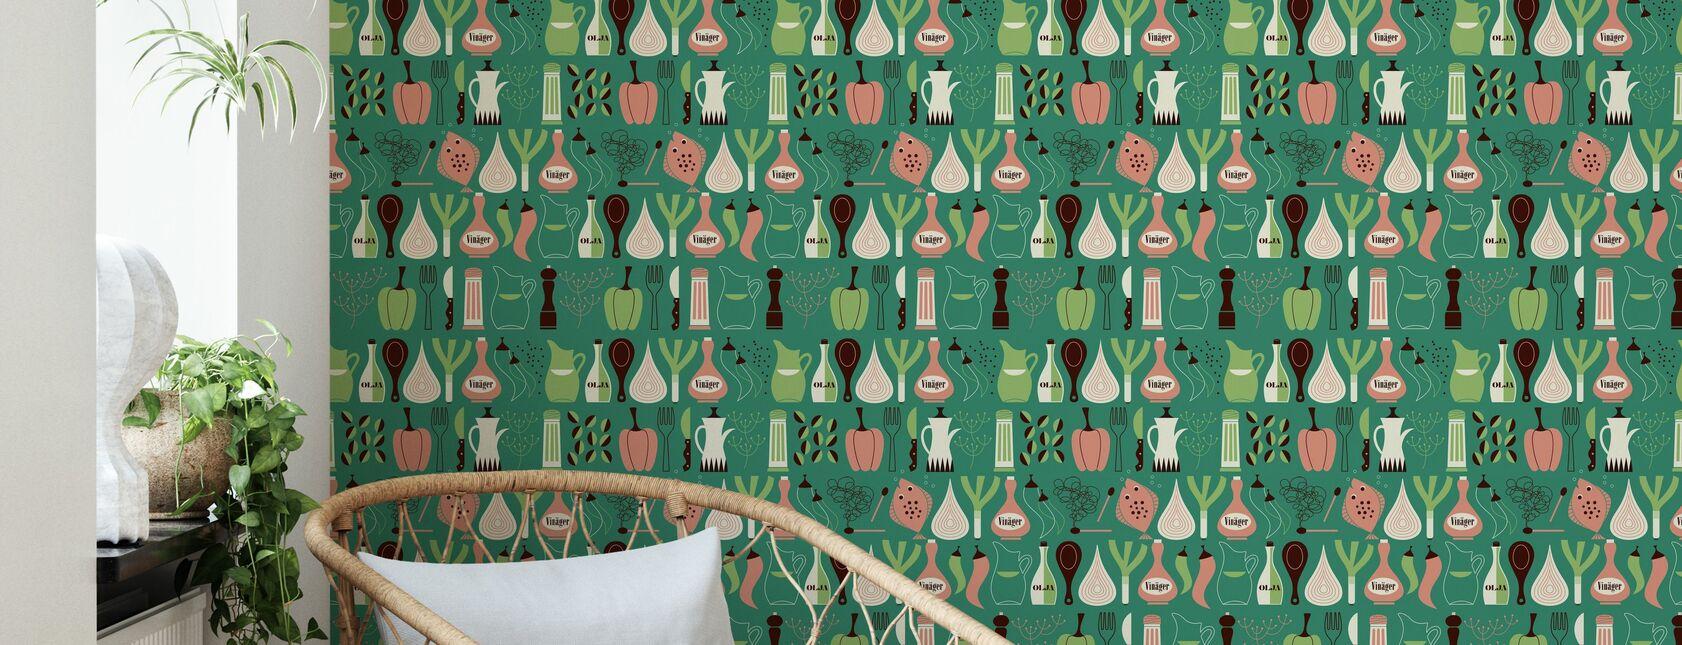 Vinegar - Green - Wallpaper - Living Room